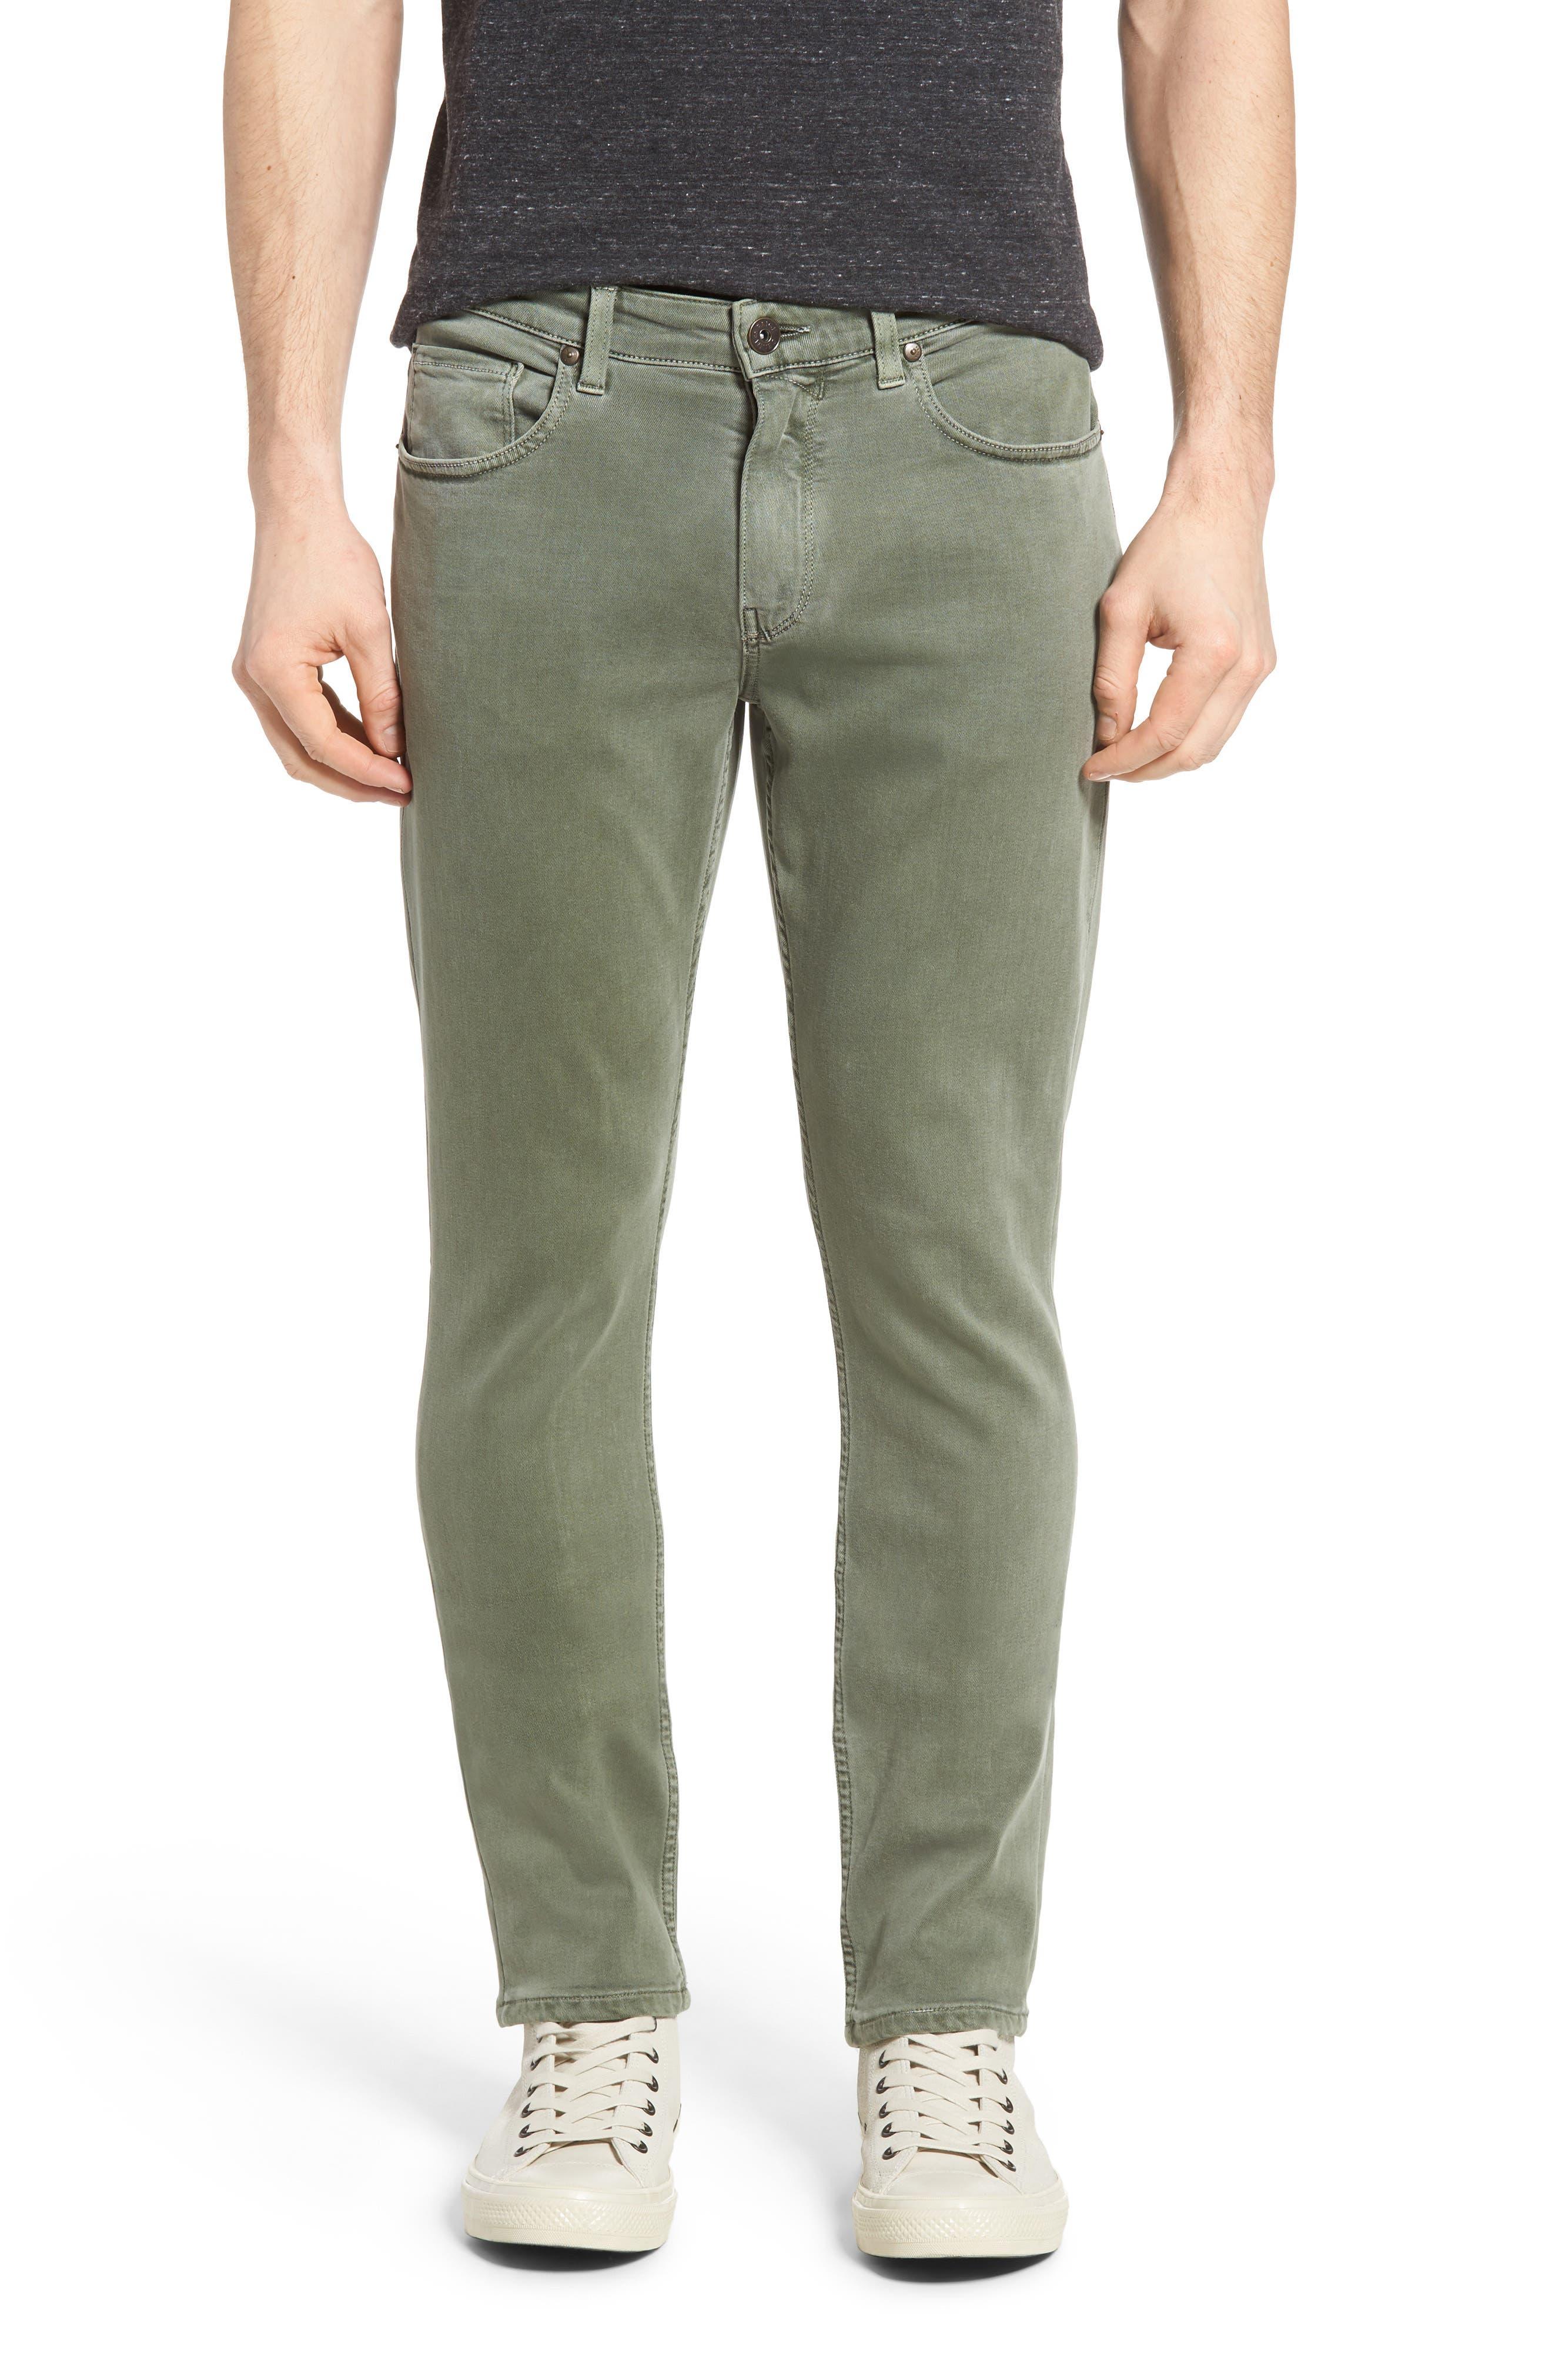 Transcend - Lennox Slim Fit Jeans,                         Main,                         color, Greenhouse